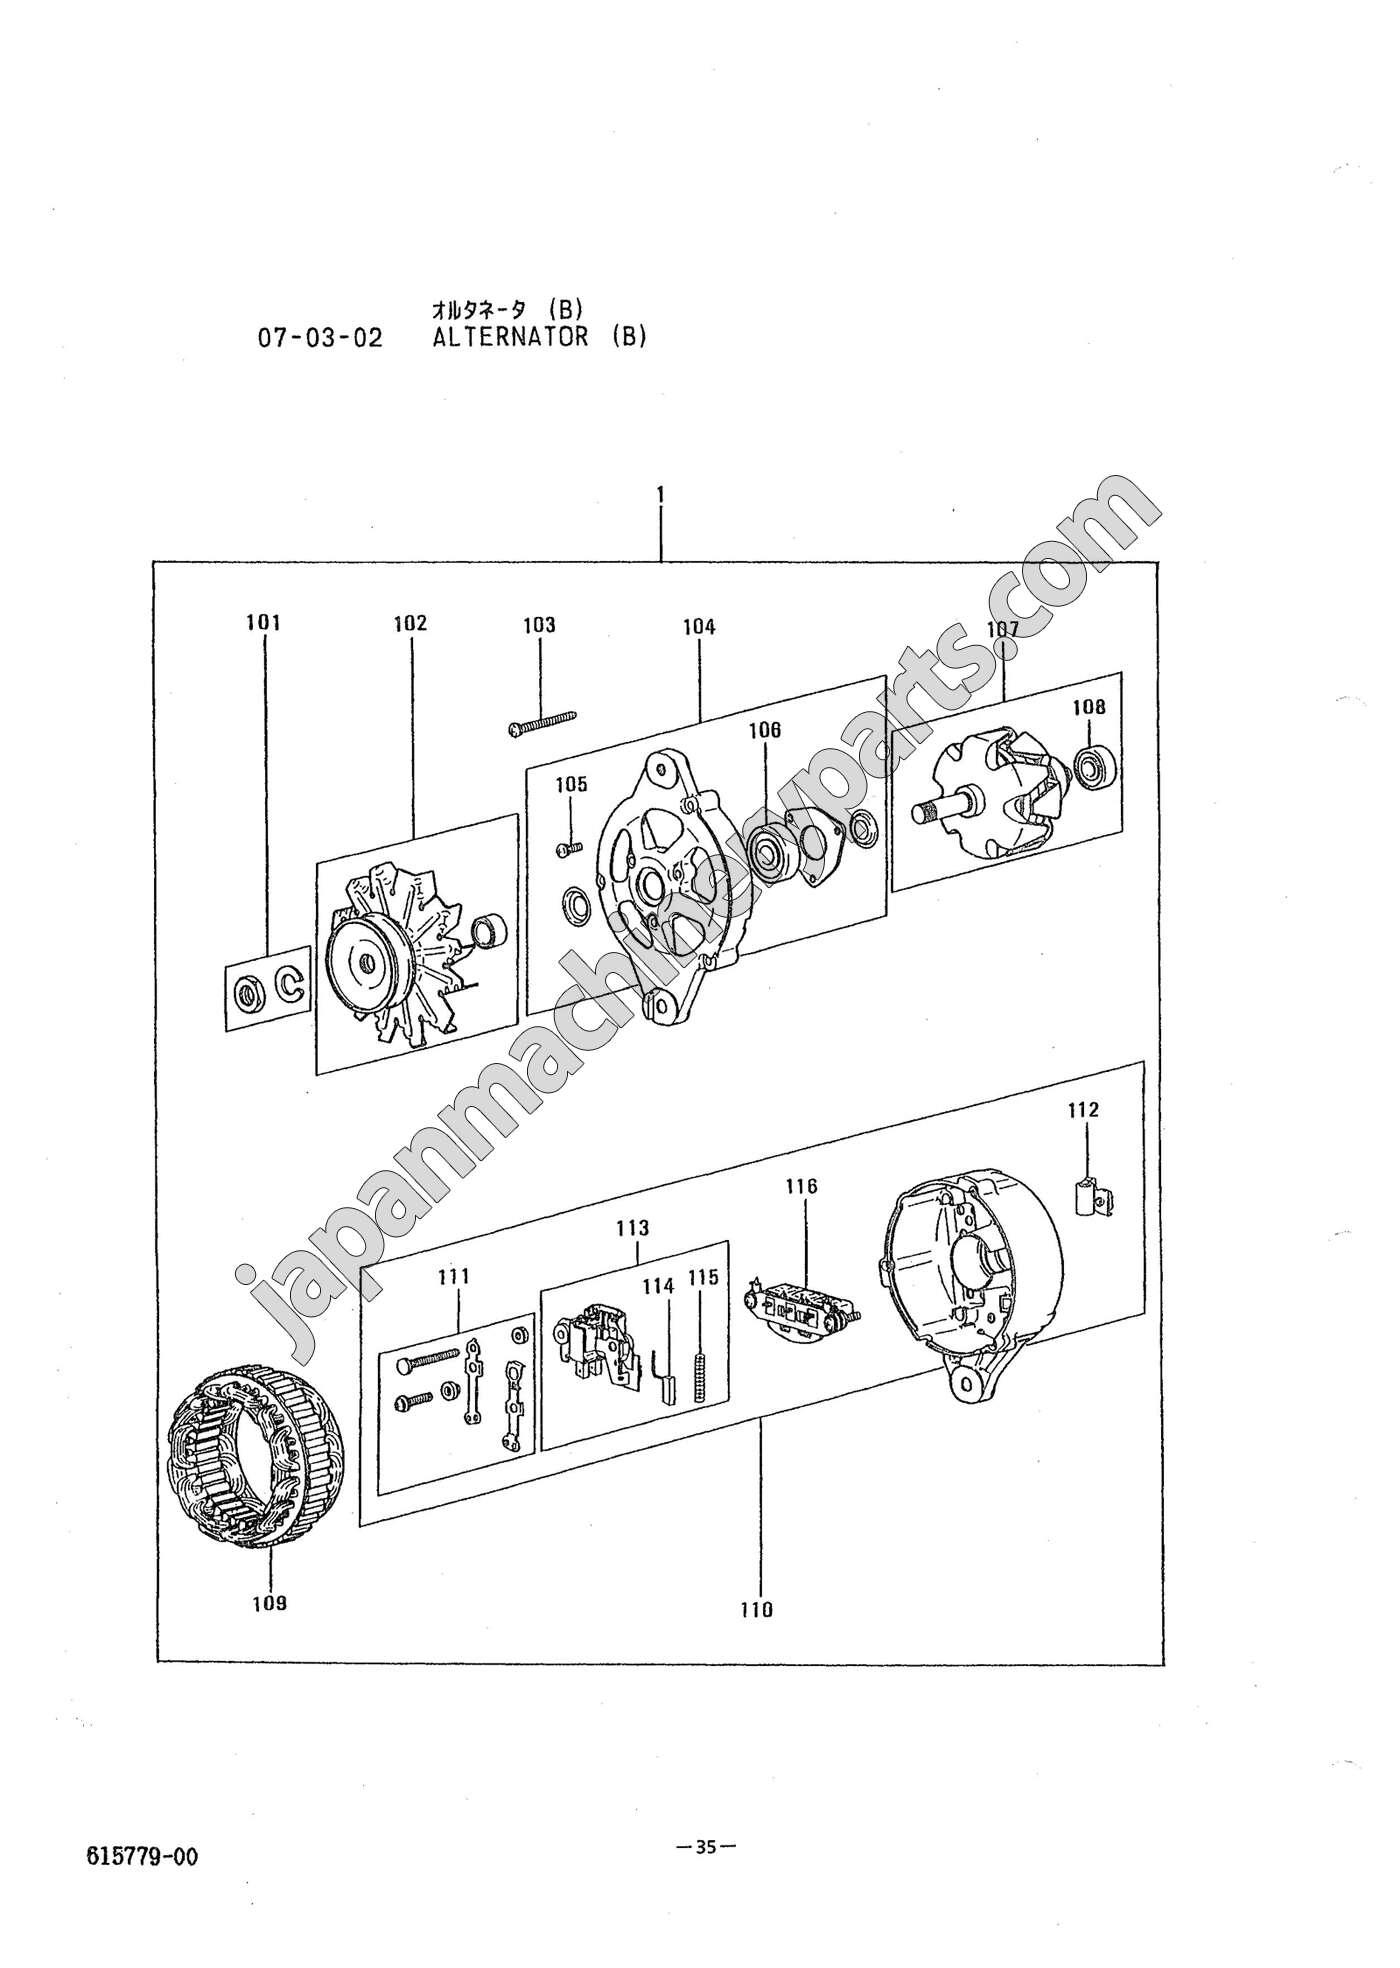 Parts For Mitsubishi K4n Alternator Engine Diagram